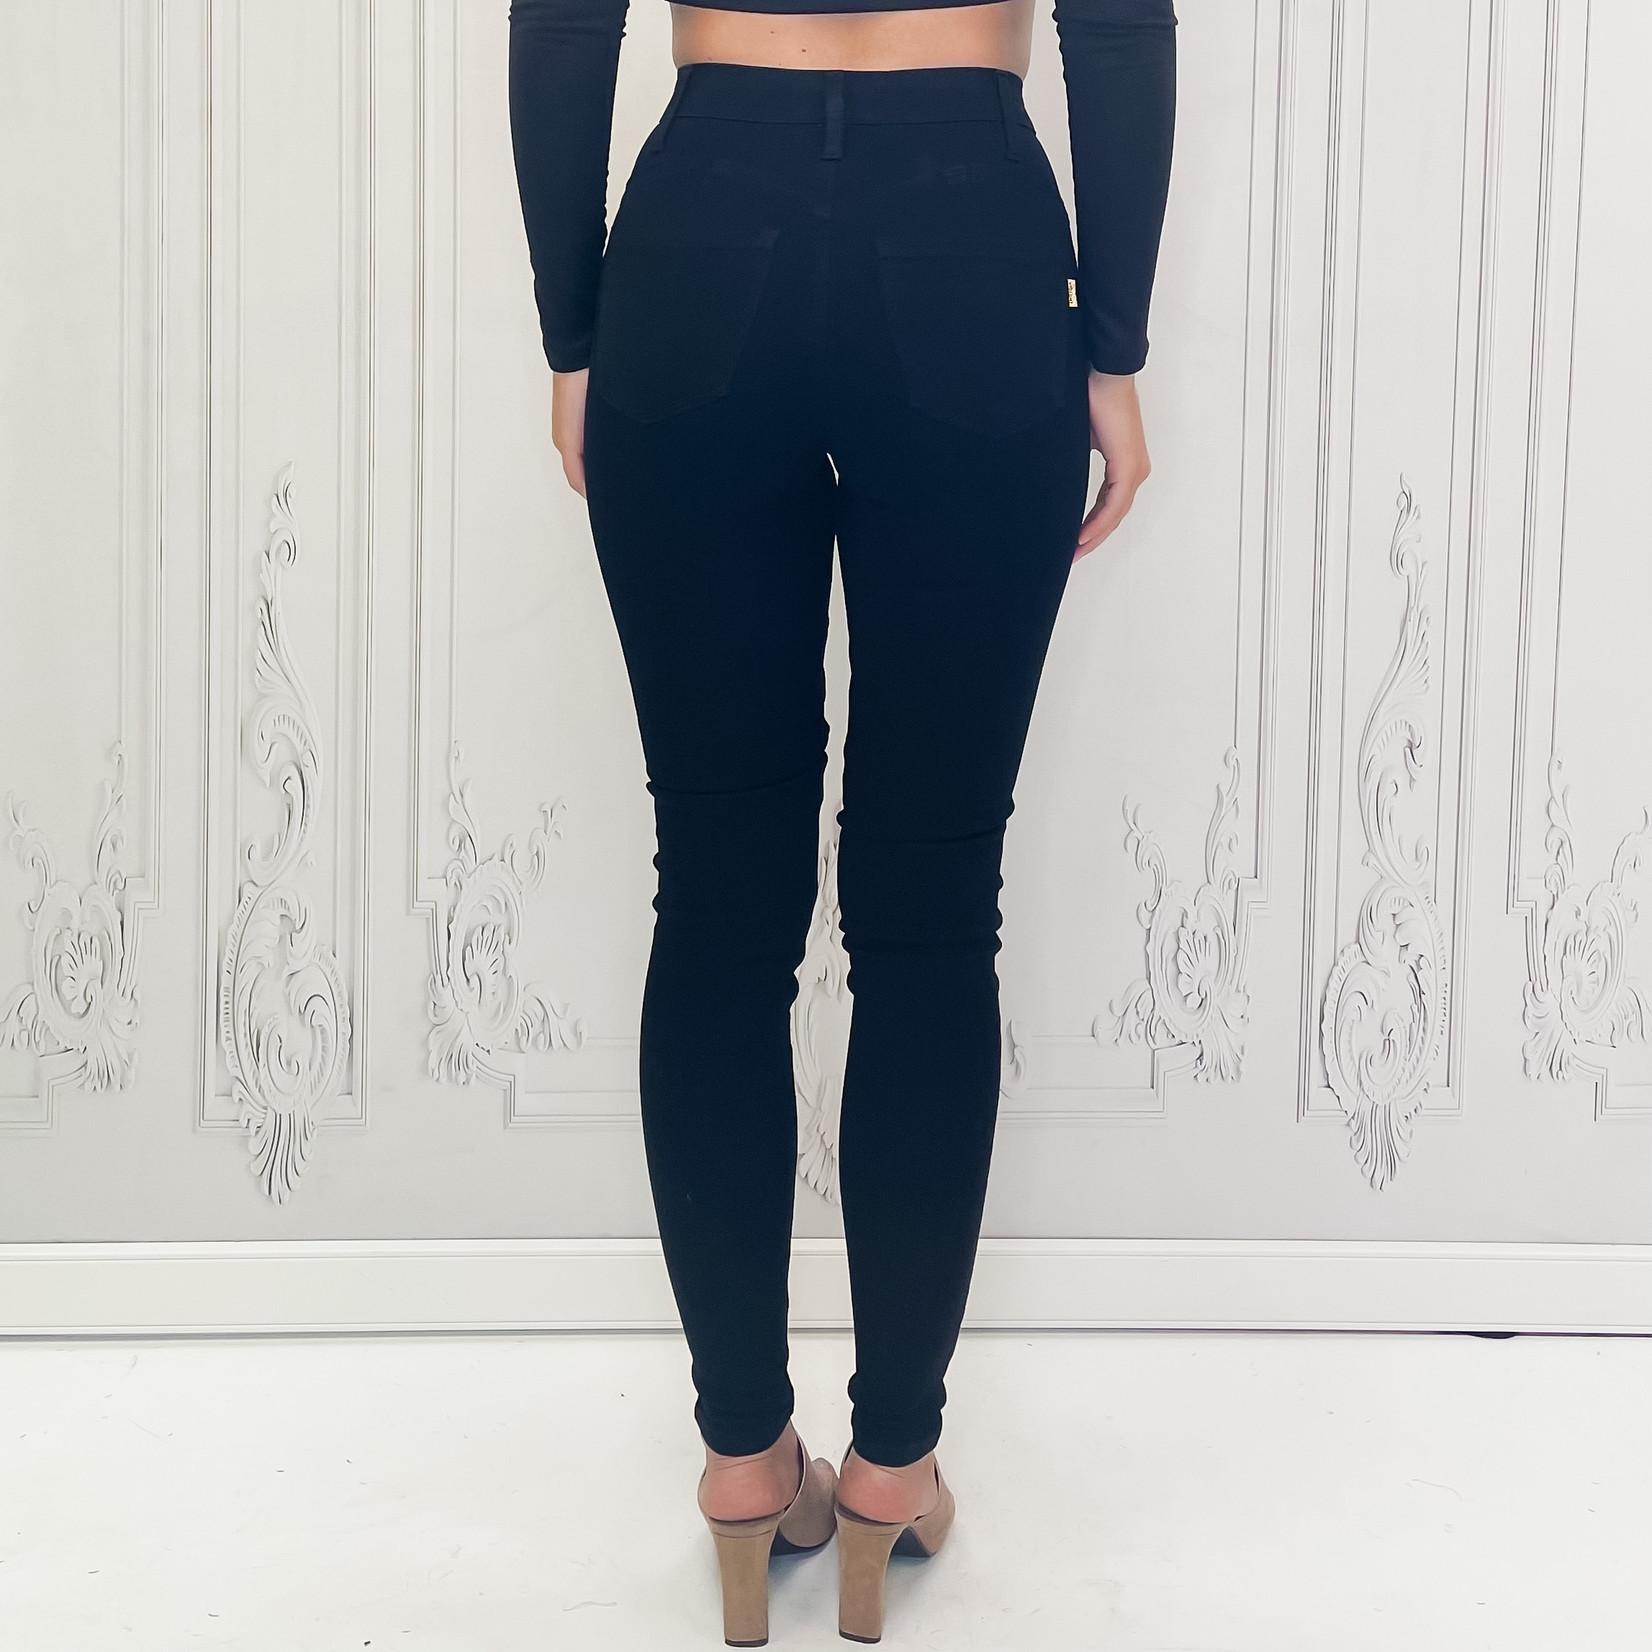 Vi classic skinny jean